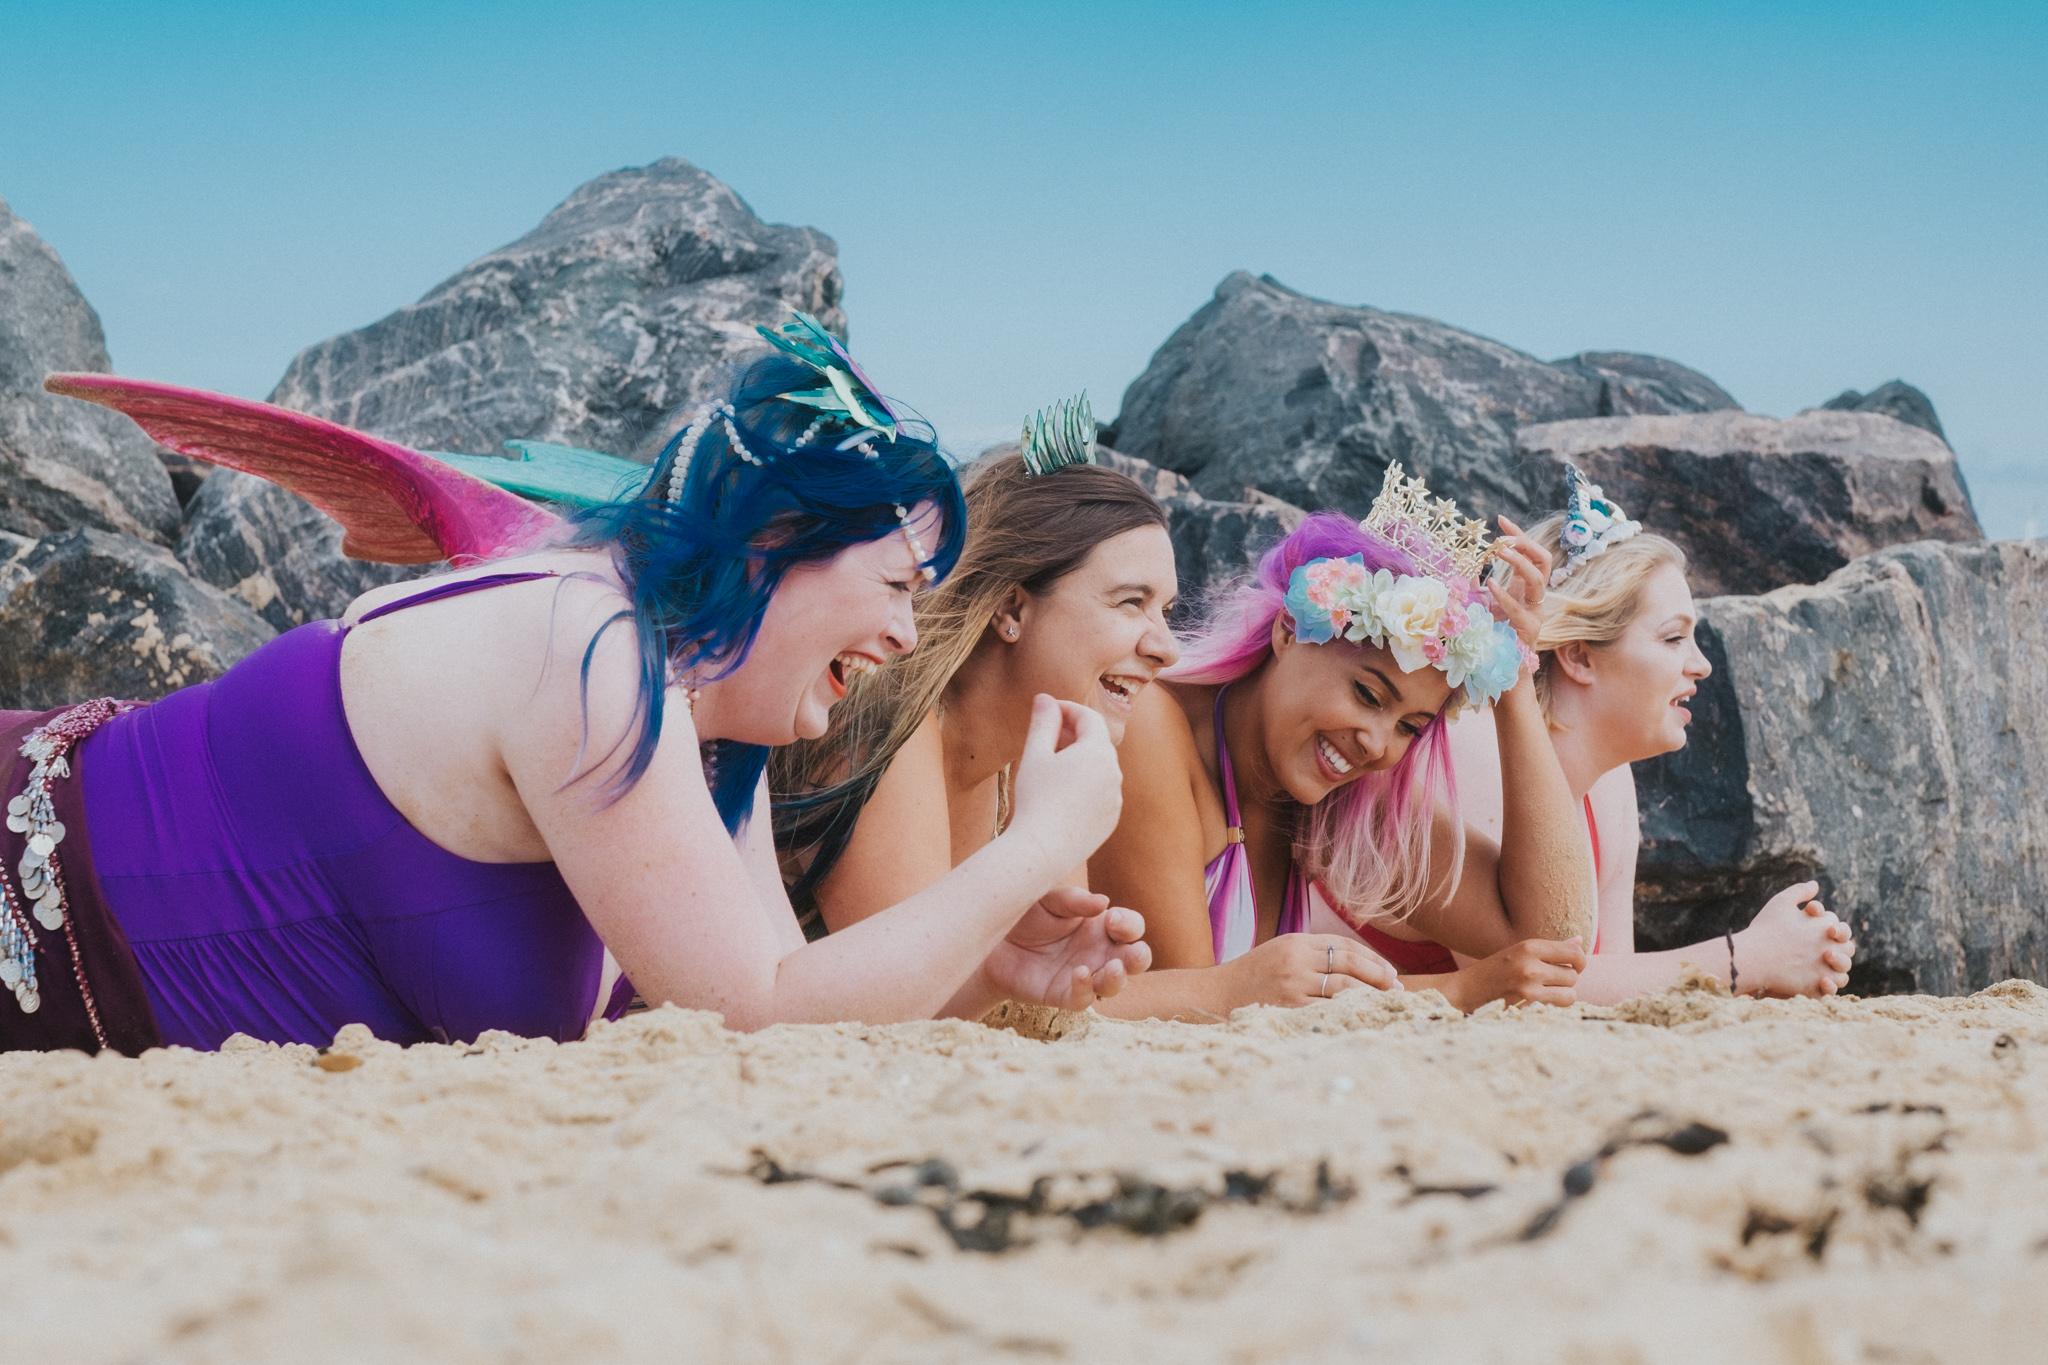 Body-Positive-Mermaids-Grace-Elizabeth-Mermaiding-UK-Alternative-Wedding-Photographer-Colchester-Essex-Suffolk-Norfolk-Devon (6 of 59).jpg